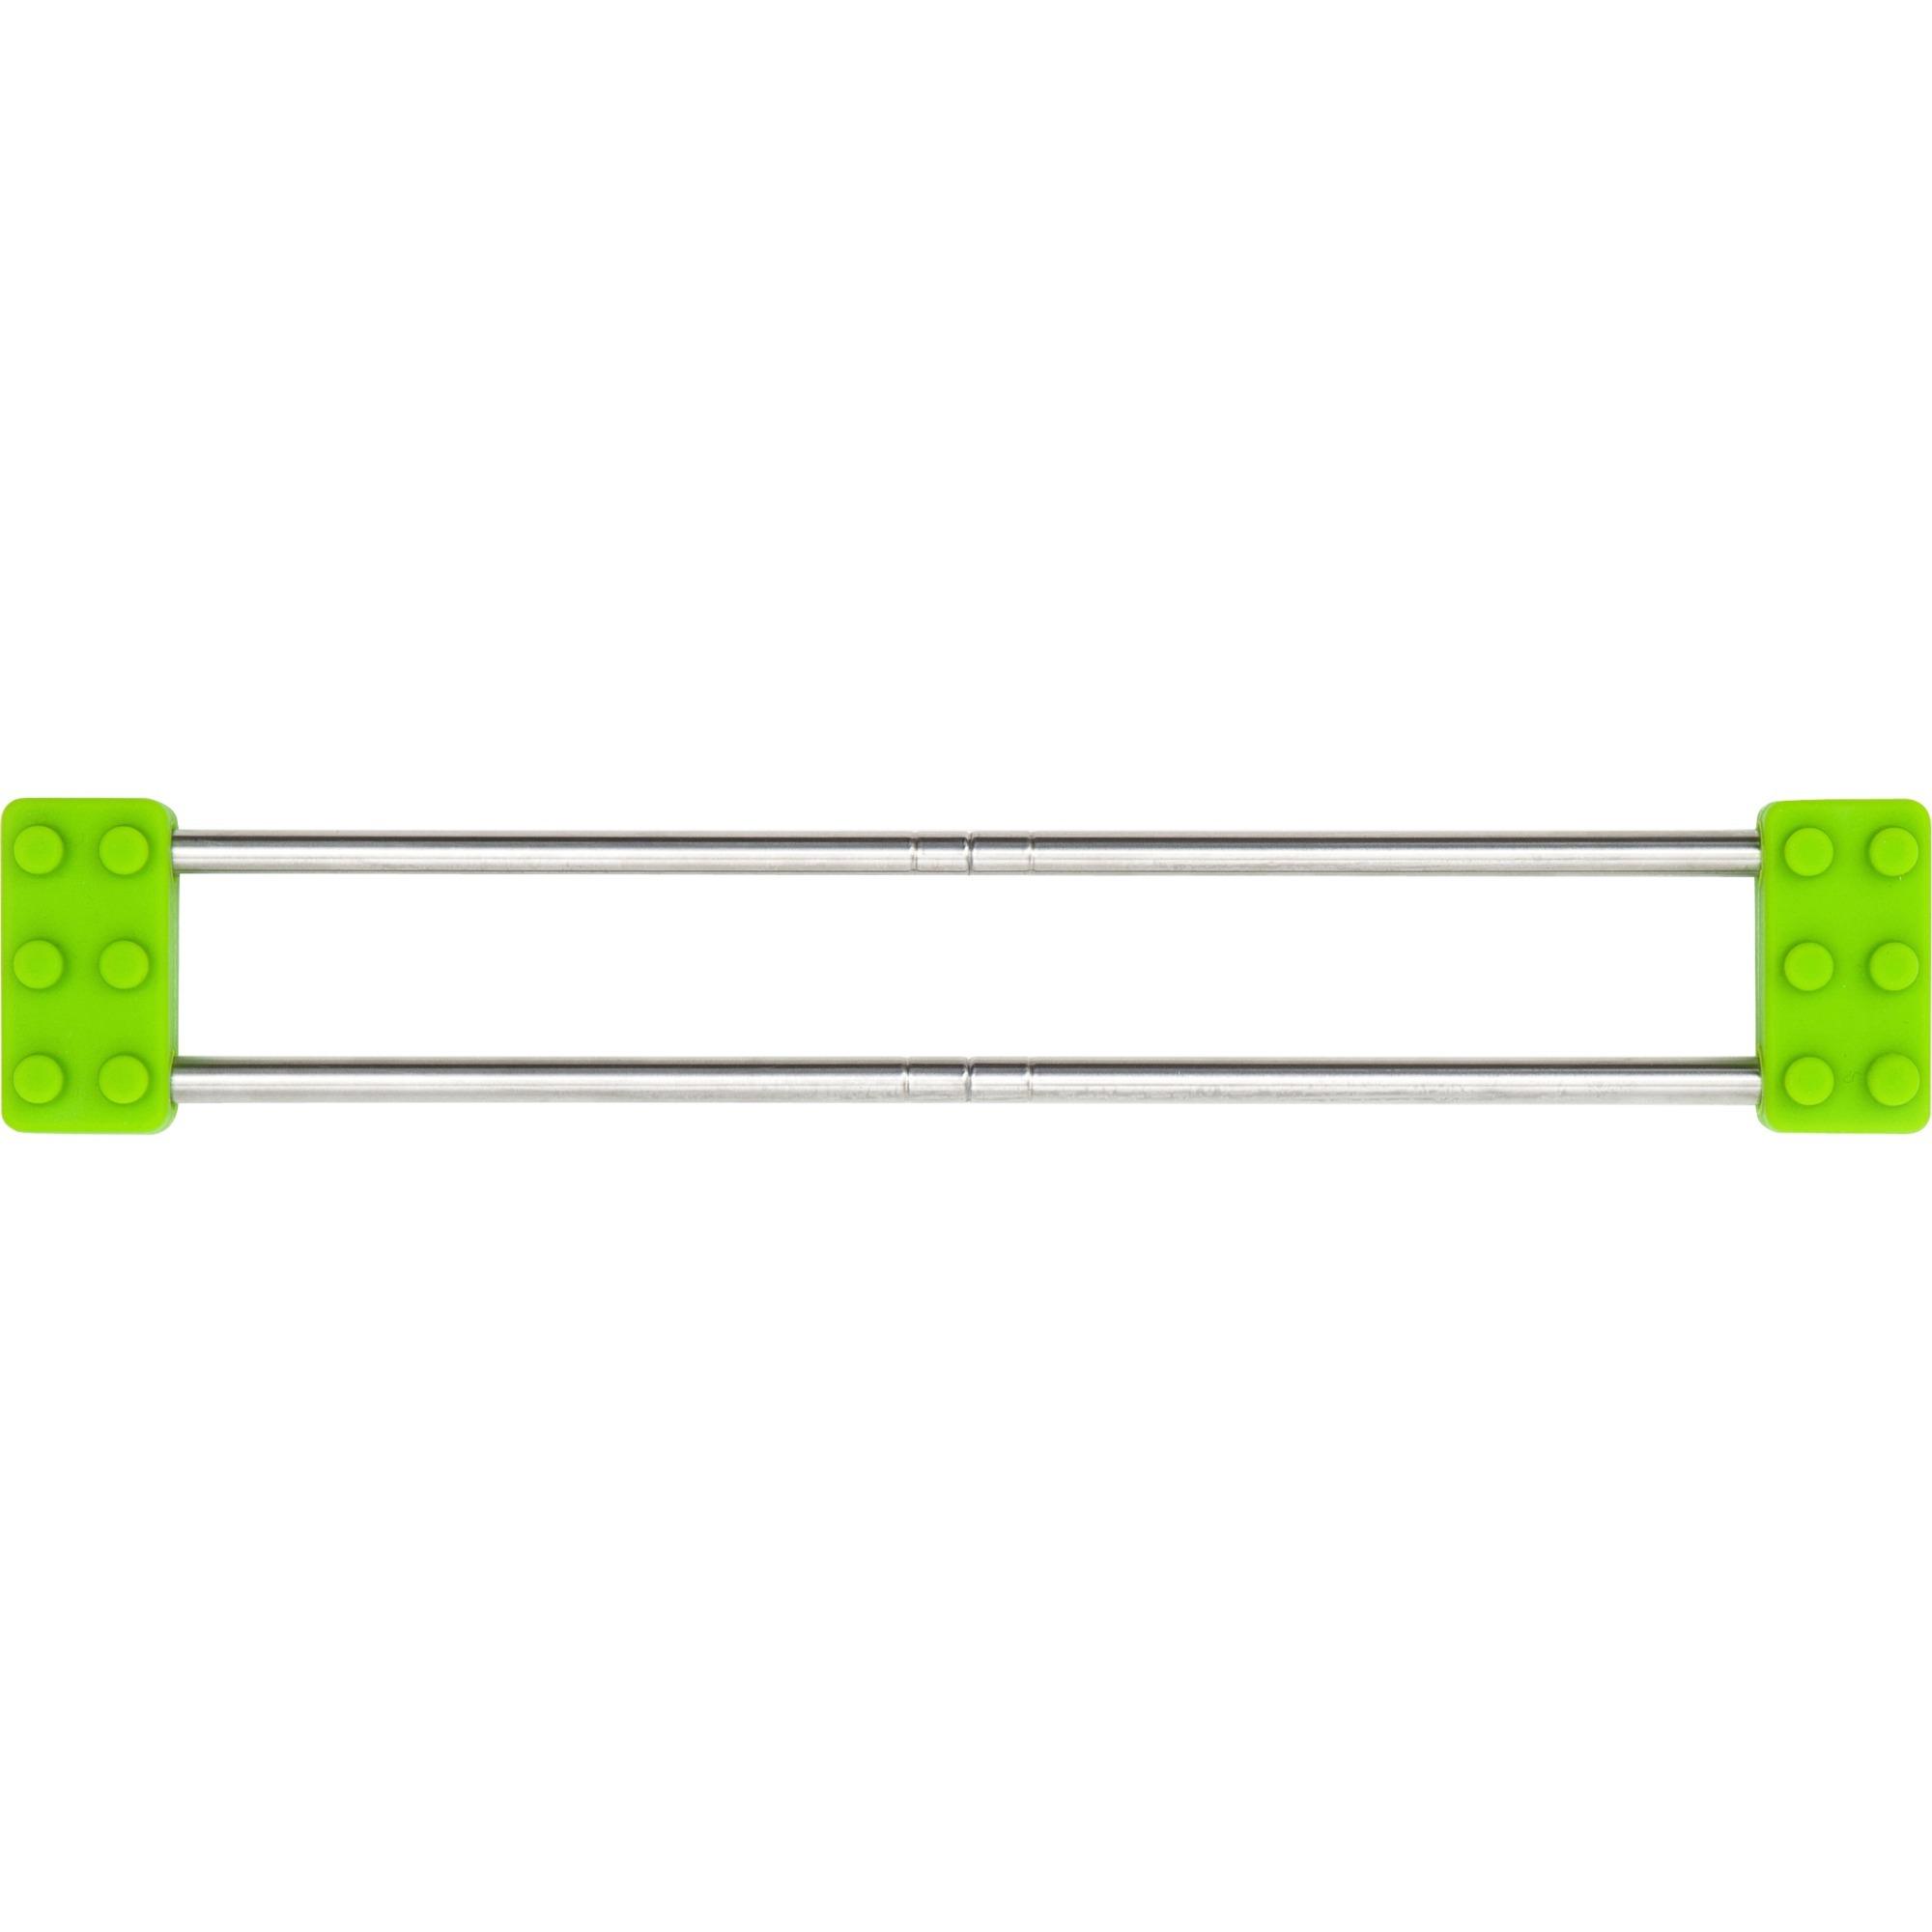 SanniShoo drip.line Abtropfhilfe, Abtropfgestell grün/silber